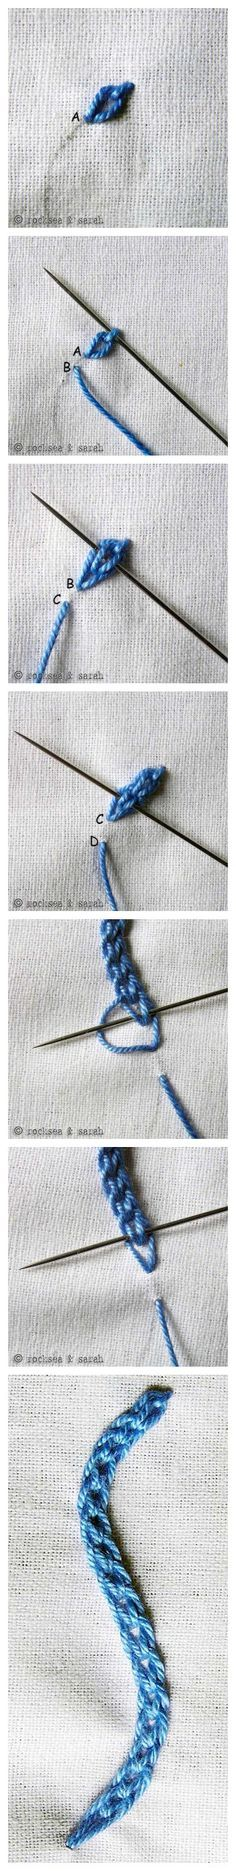 stitch techniques